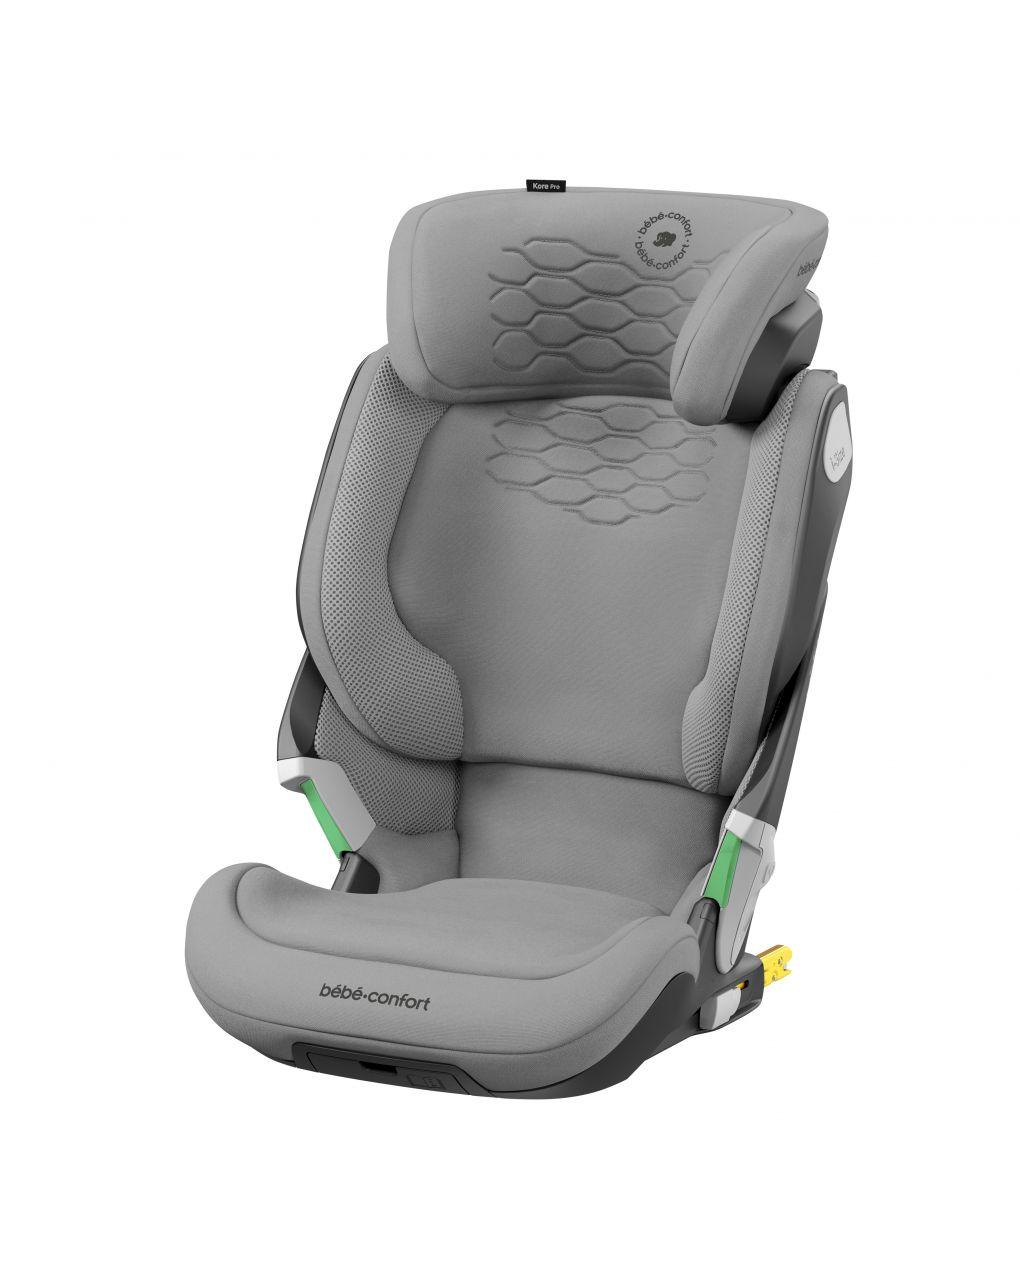 Maxi Cosi Κάθισμα Αυτοκινήτου Kore Pro i-Size, Graphite